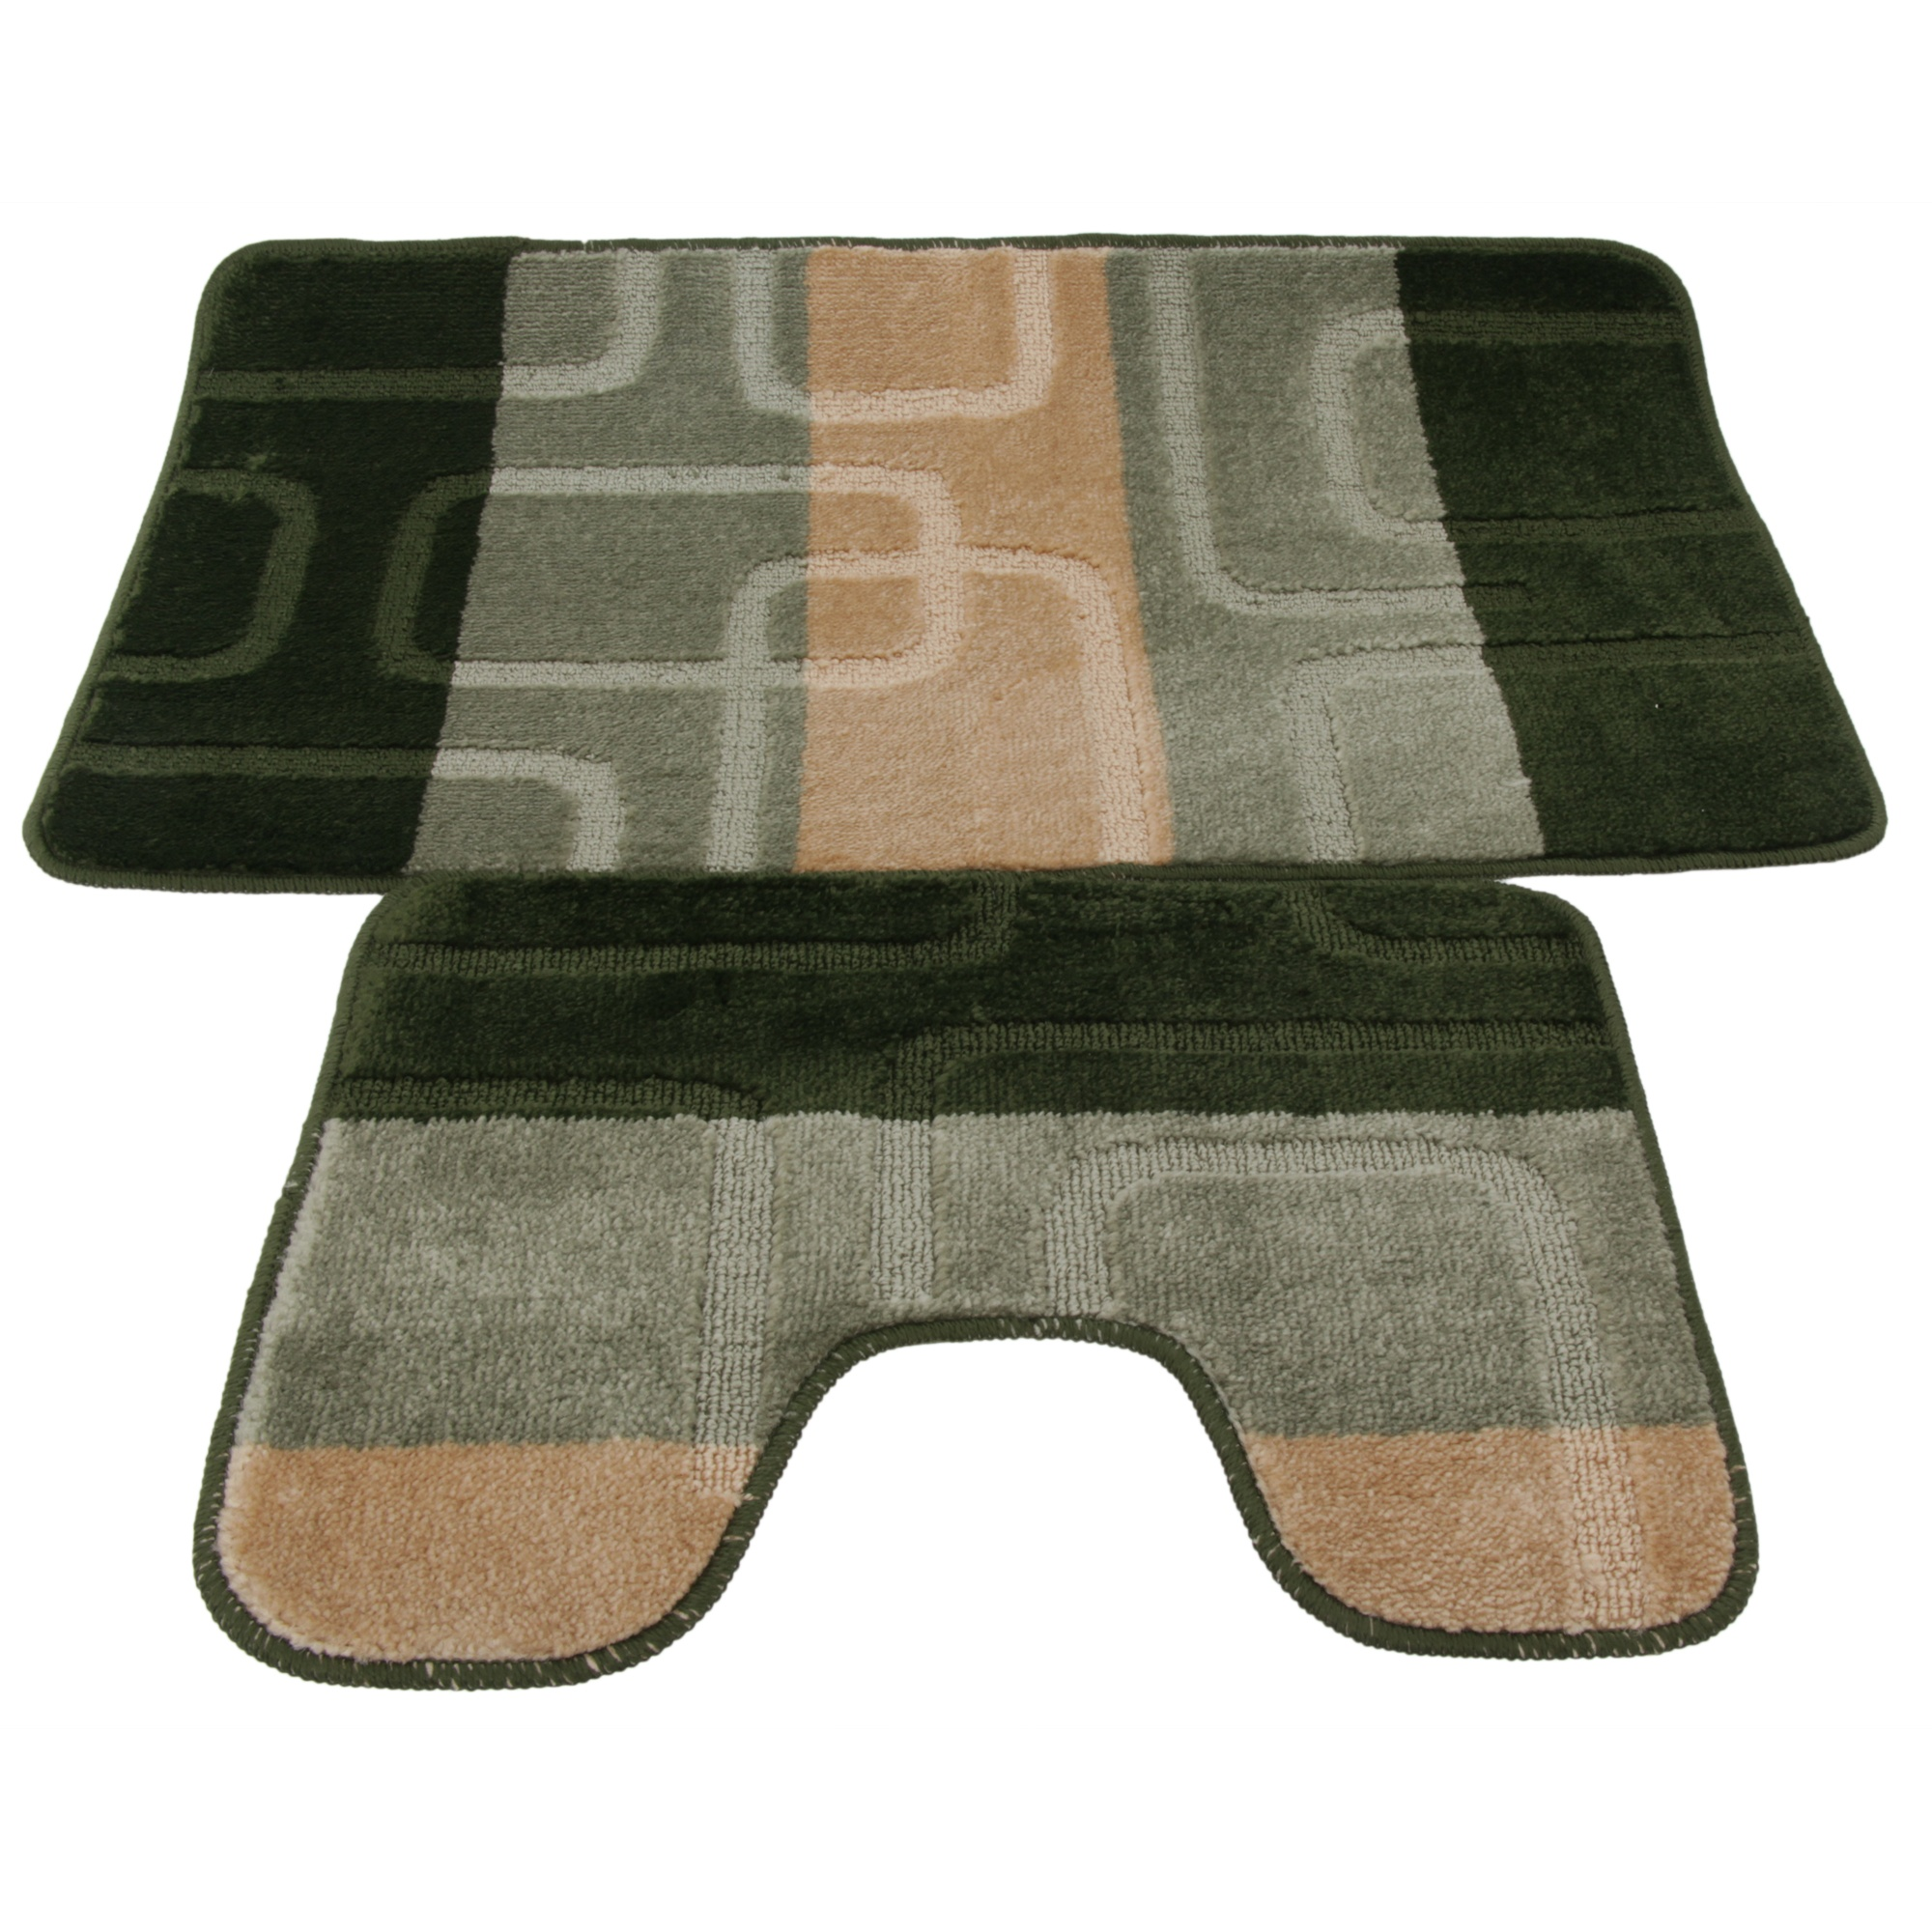 2 Piece Square Design Bath Mat And Pedestal Mat Set 5 Options Ebay